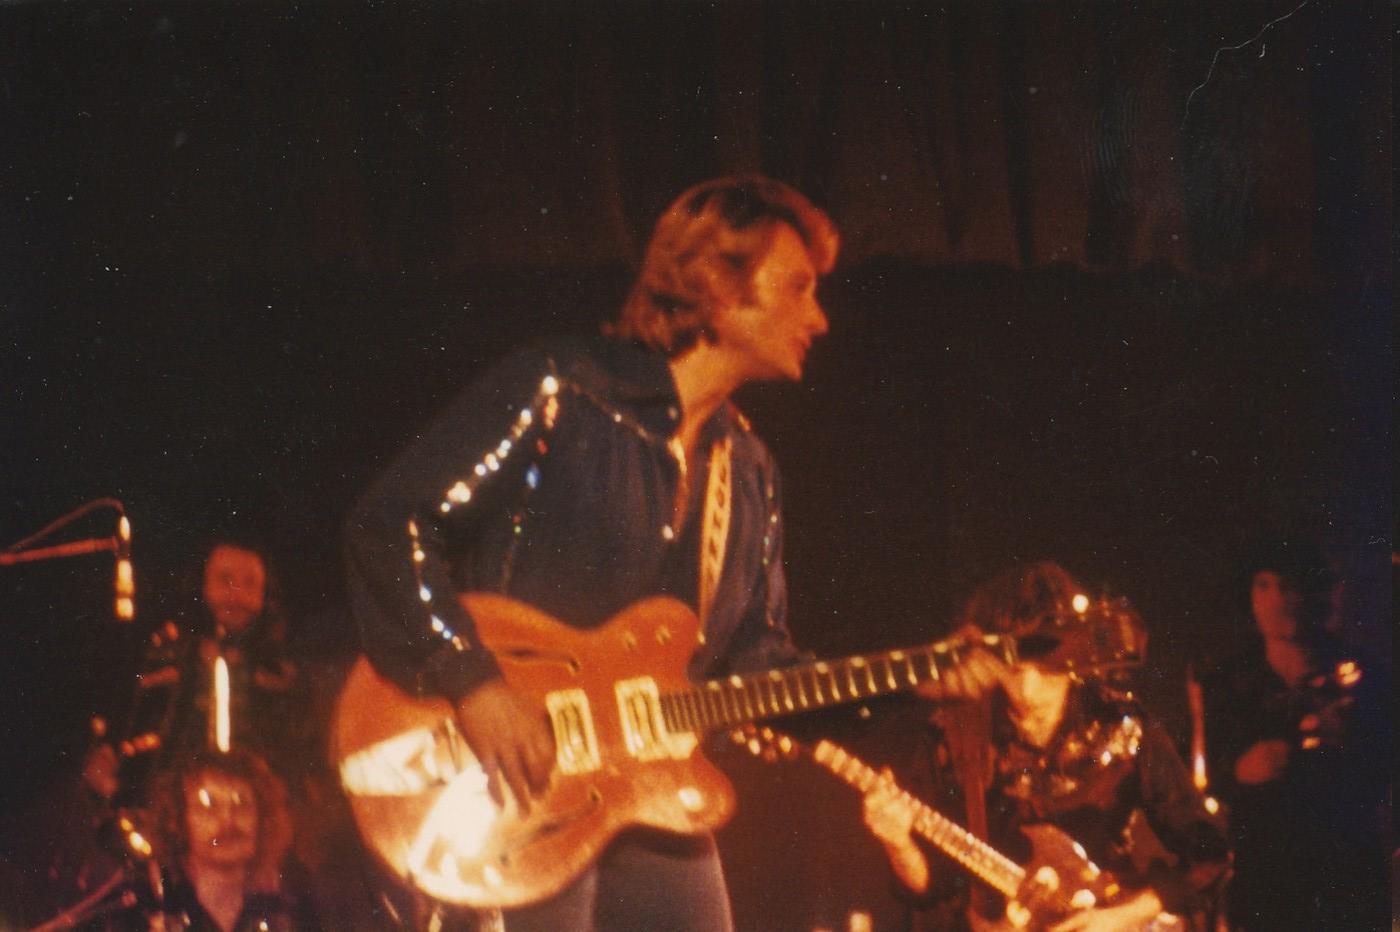 INÉDIT  :  JOHNNY HALLYDAY EN TOURNEE - HIVER 1978 -1979 ( PHOTOS INÉDITES )   Img_2628